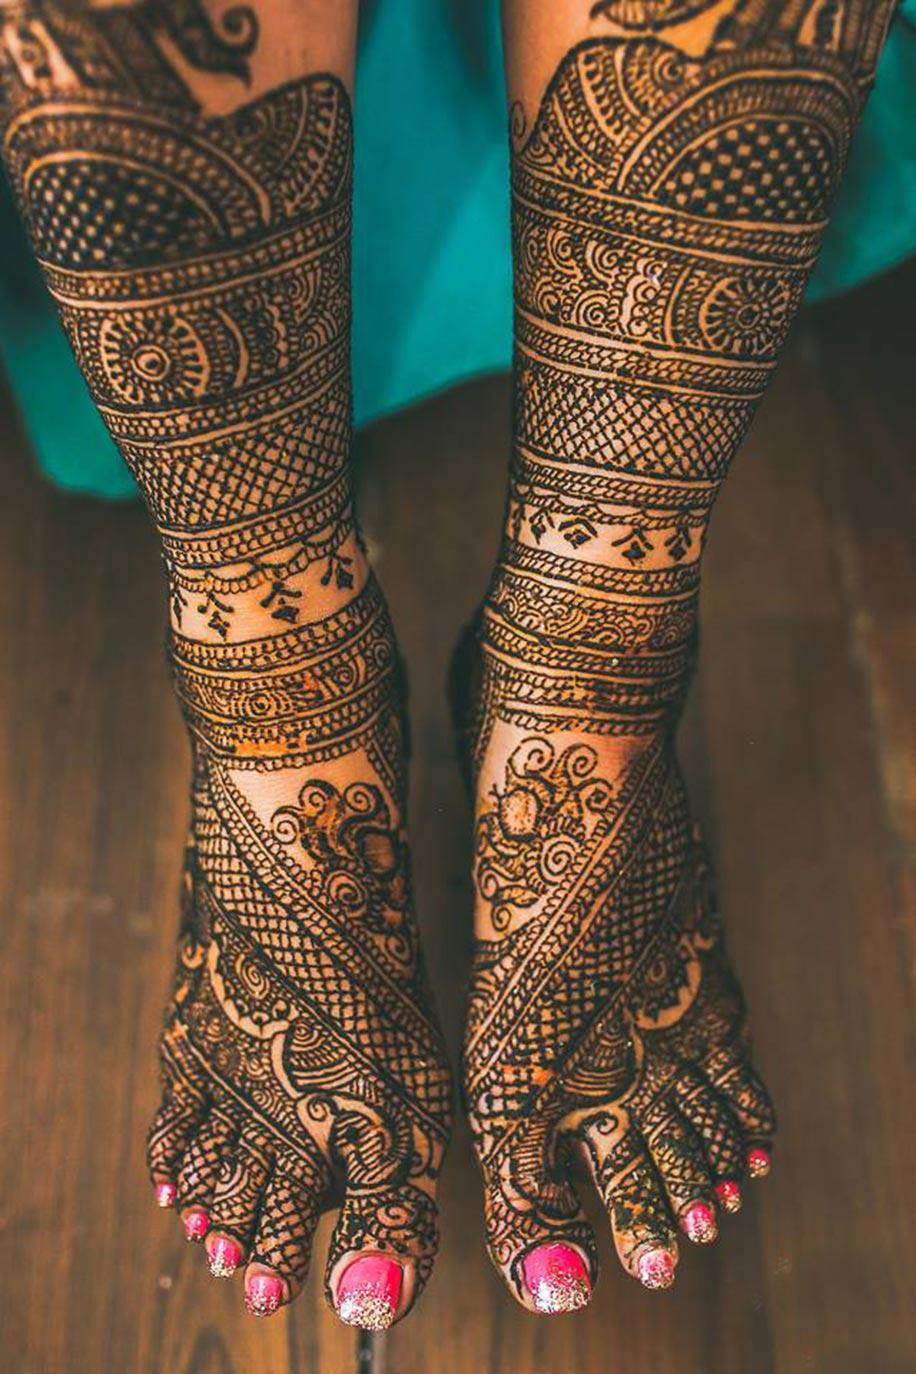 Grand Bridal Mehndi Designs : Stunning mehendi designs for your wedding bridal